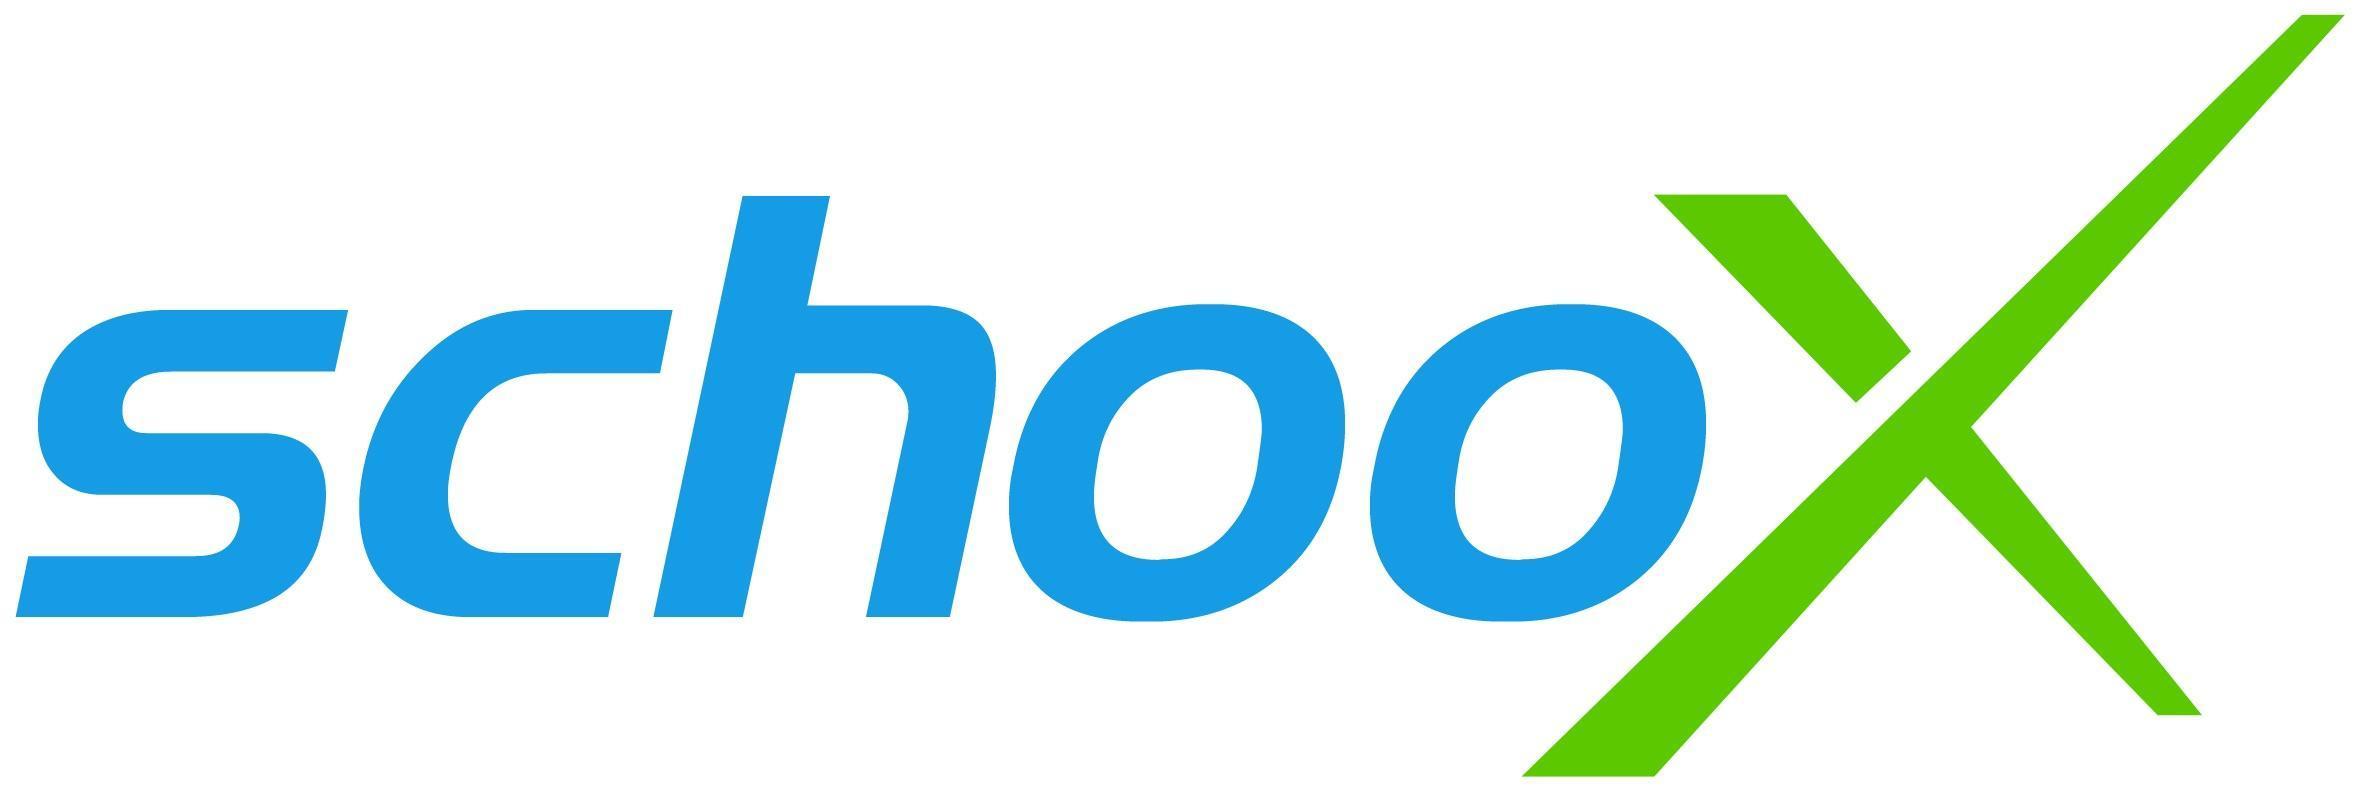 schooX company logo